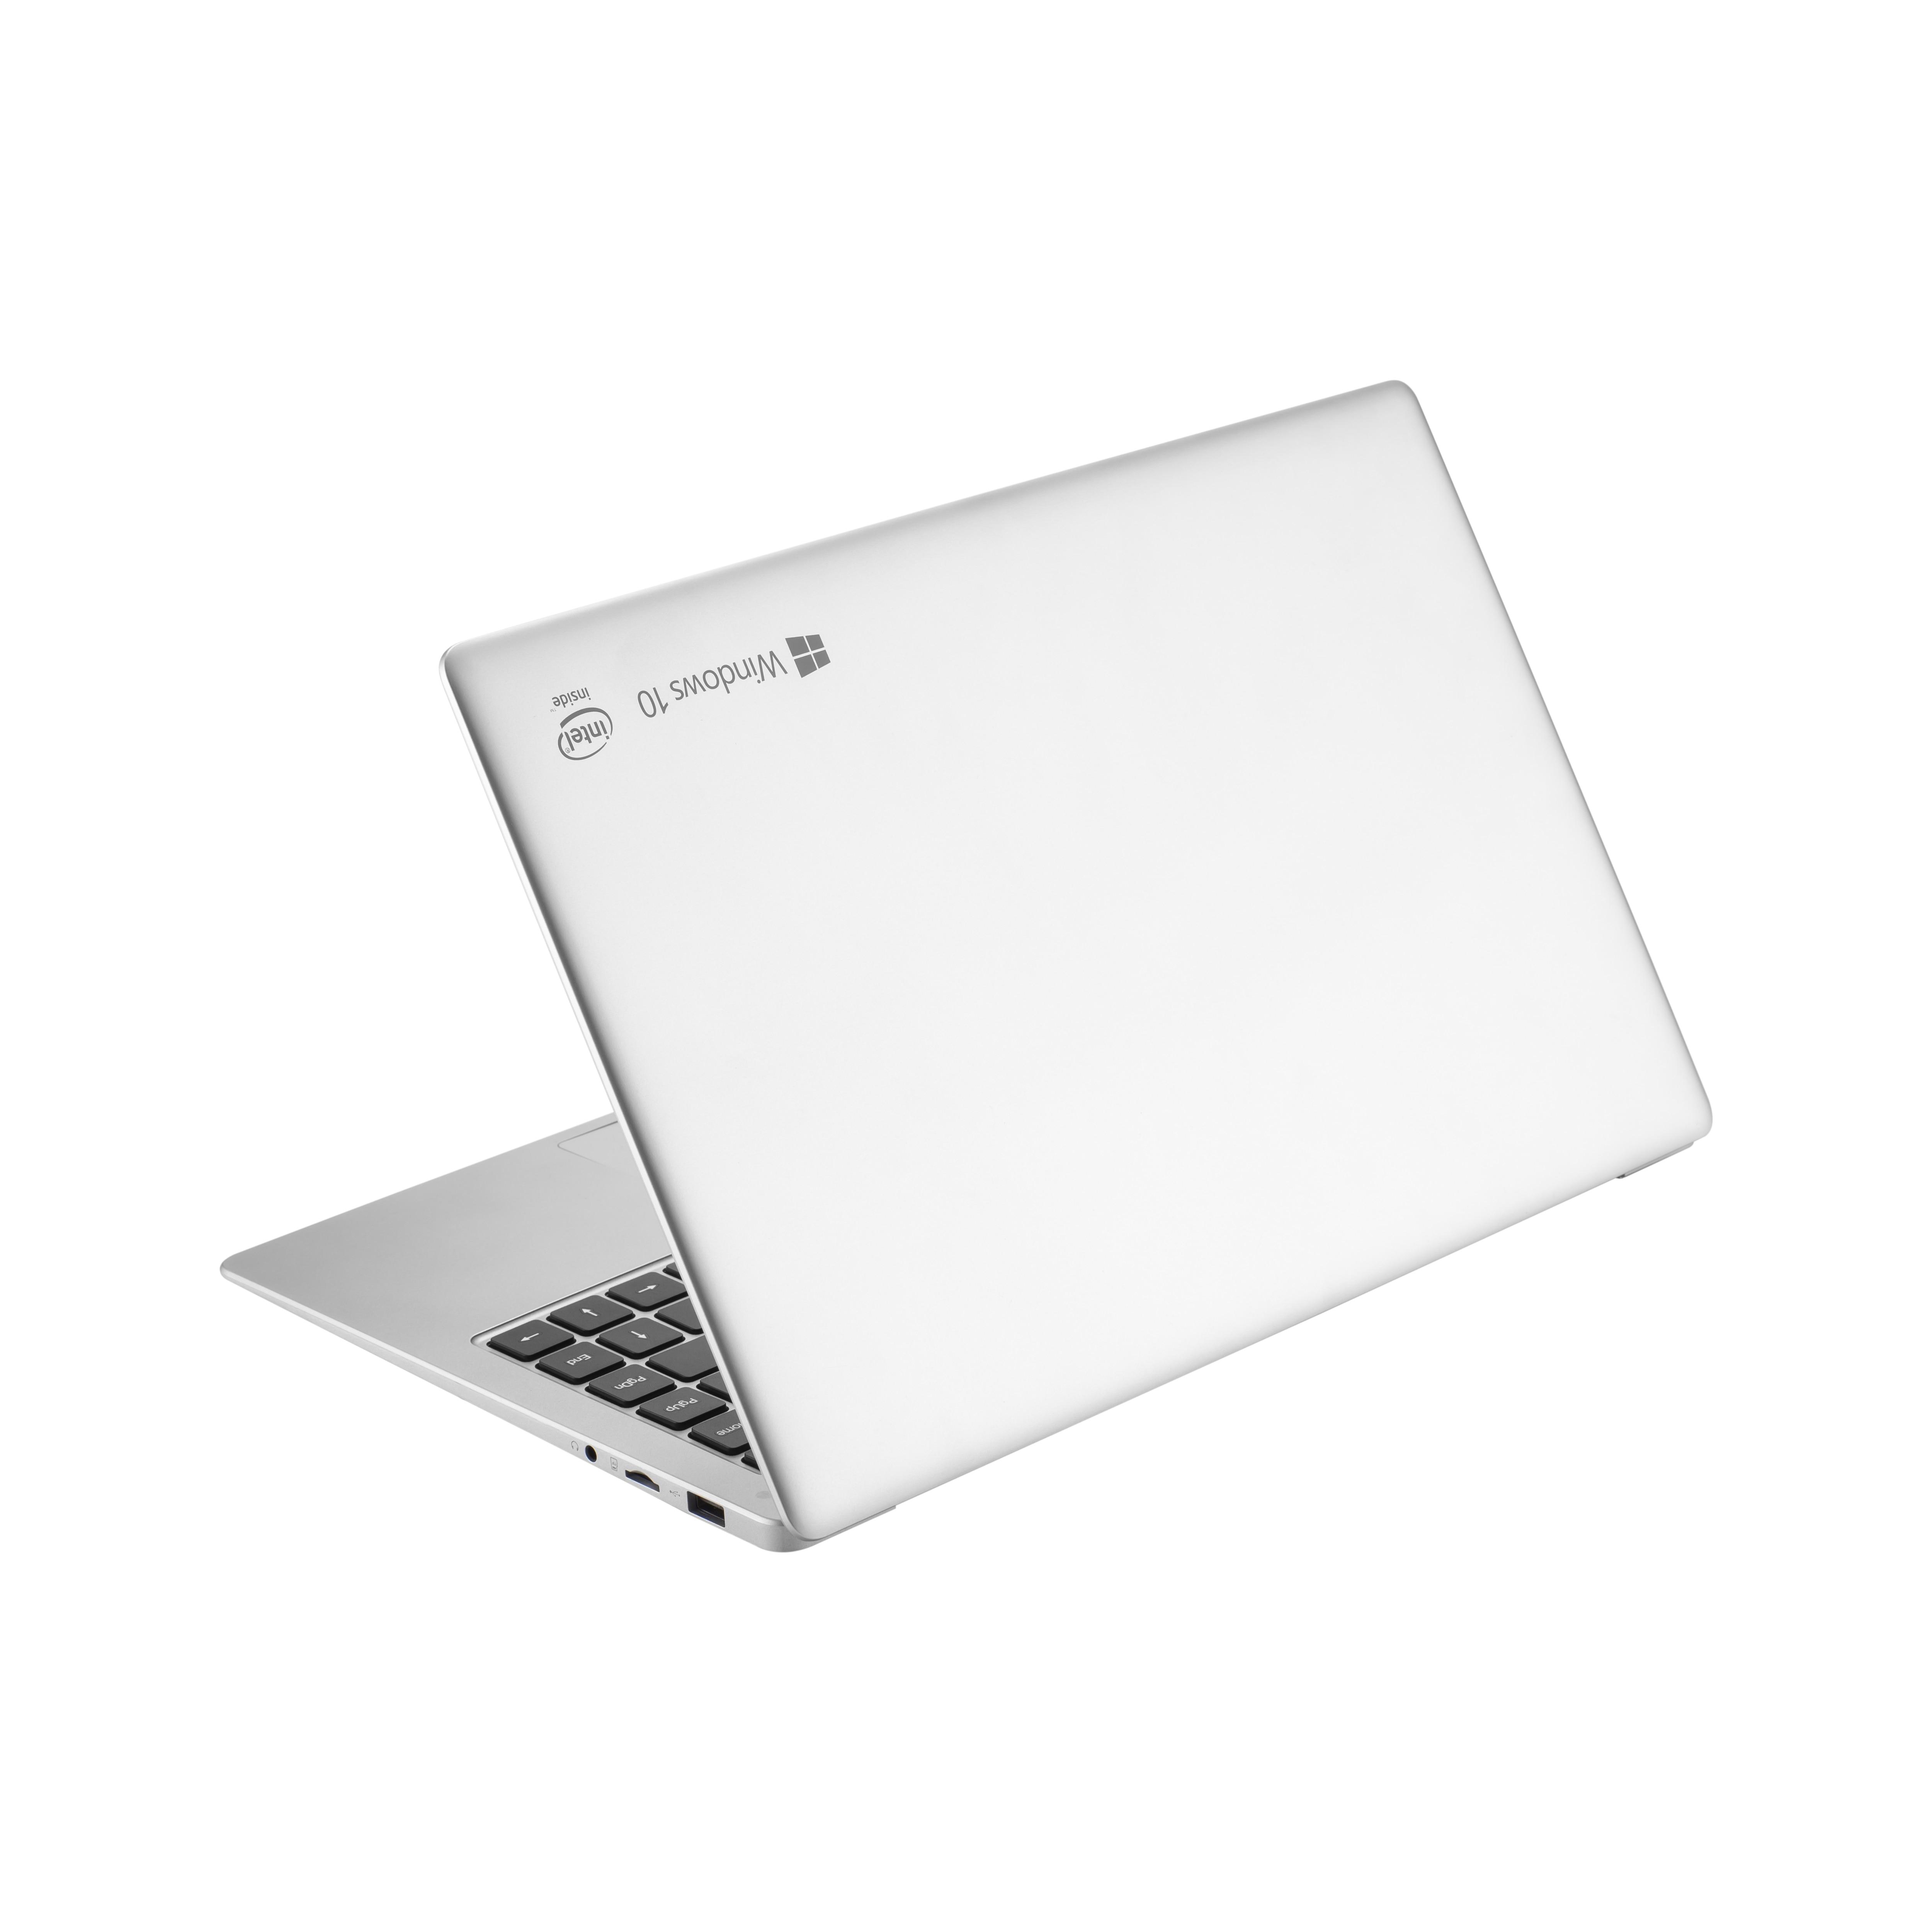 "14.1"" 1920*1080 Pipo W14 Laptop Win10 Pro Intel N3450 8G RAM 128G ROM + 128G/256G/512G SSD Notebook BT HDMI 2.0MP Camera WIFI-4"